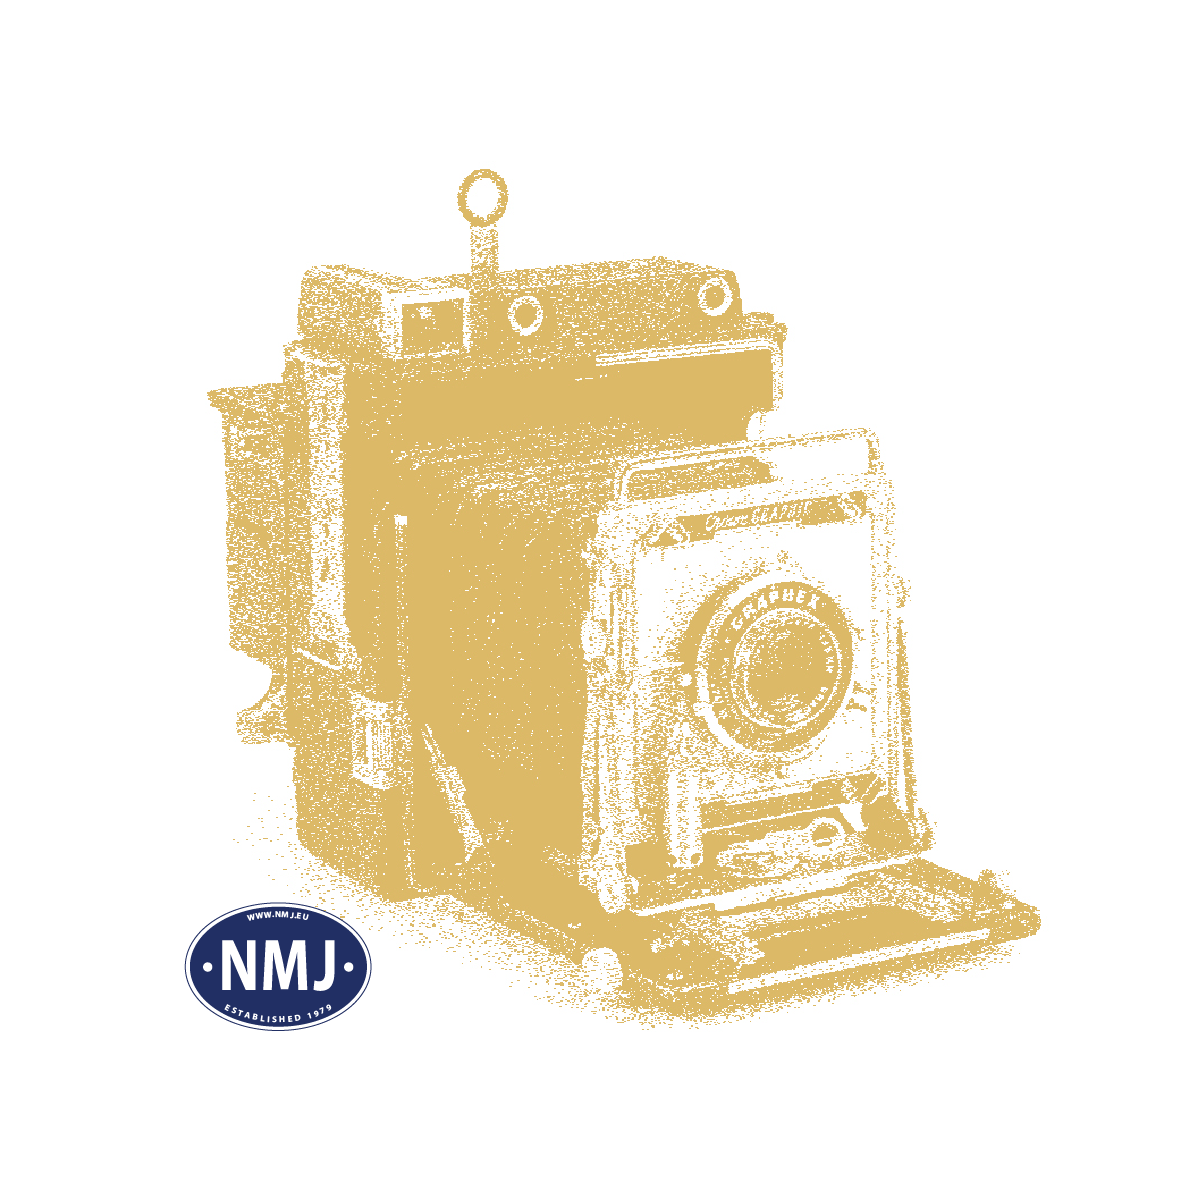 NMJT94140 - *NMJ 40 ÅR* - NMJ Topline NSB El14 2167, Nydesign, DCC m/ Lyd